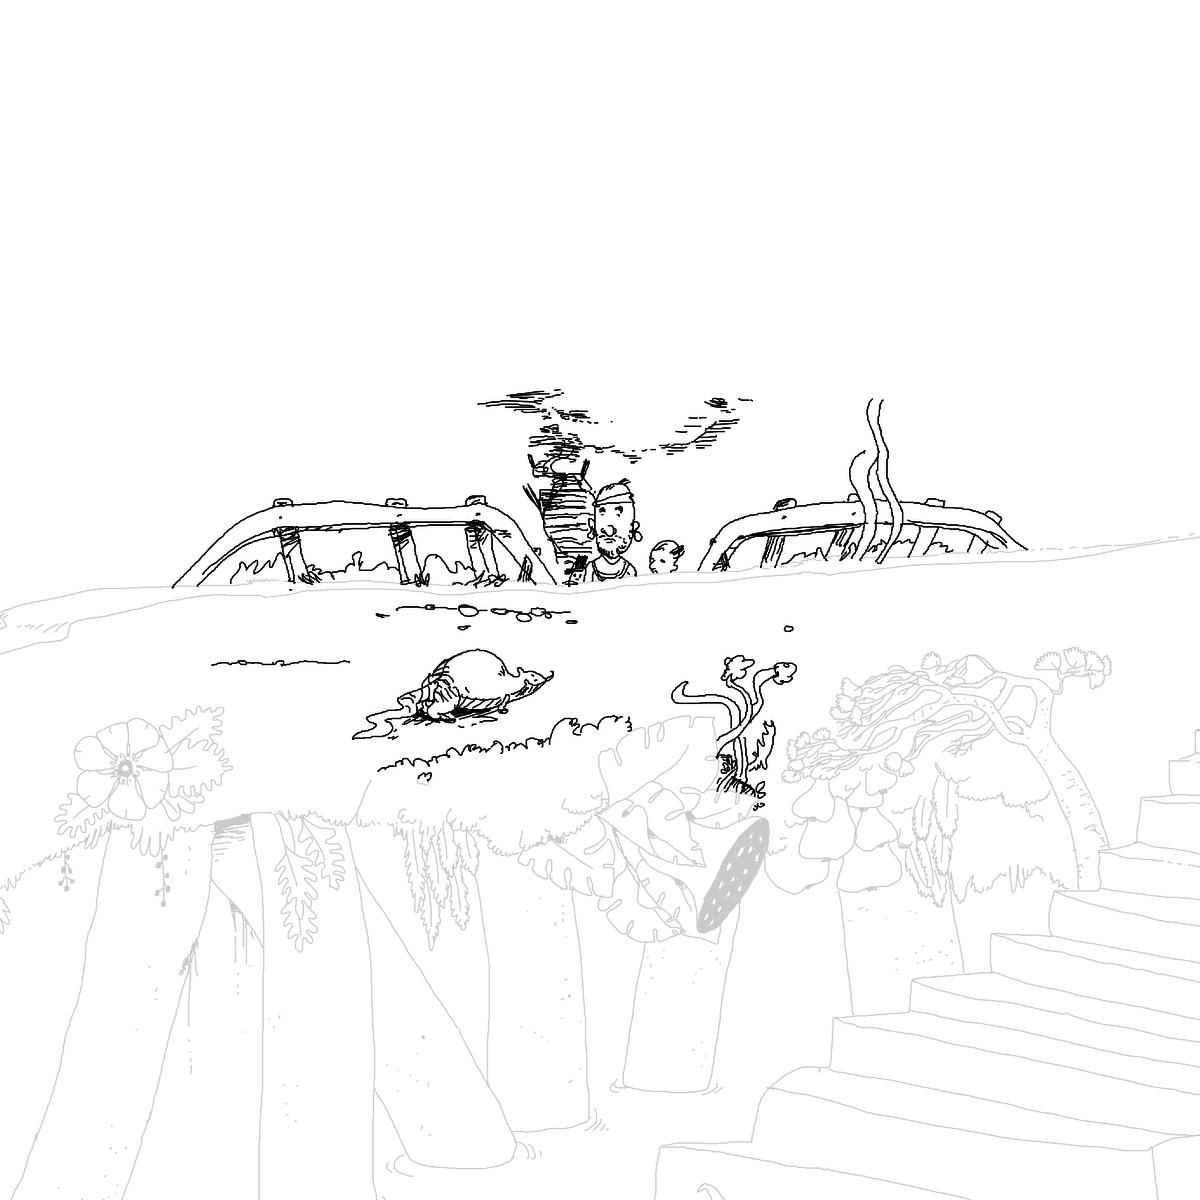 BAAAM drawing#4037 lat:78.4176025390625000lng: -4.4392714500427250